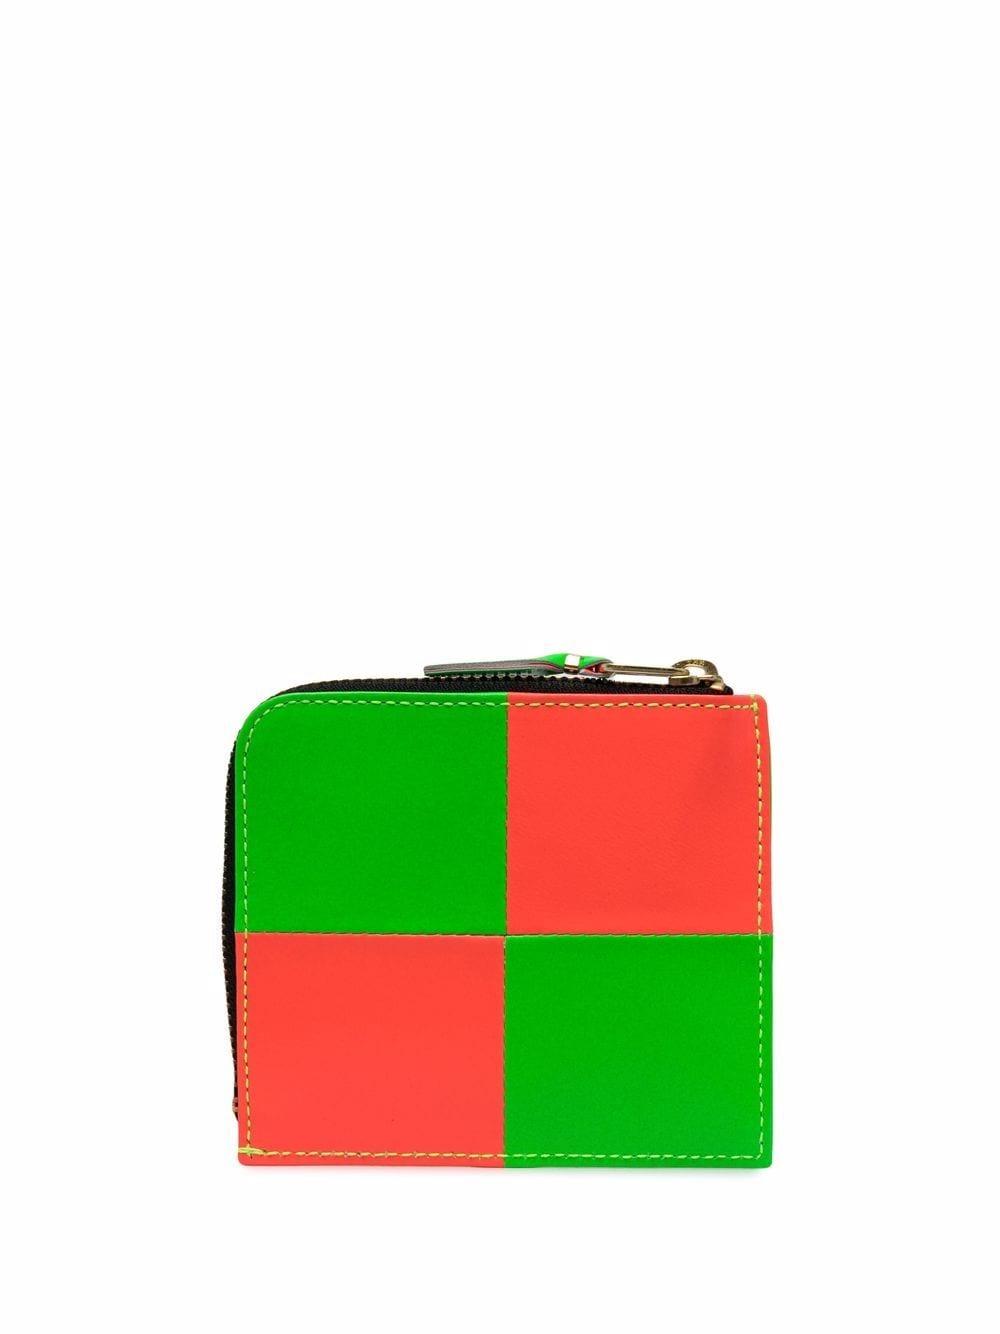 bicolor wallet unisex in leather COMME DES GARÇONS WALLET   Wallets   SA3100FS1